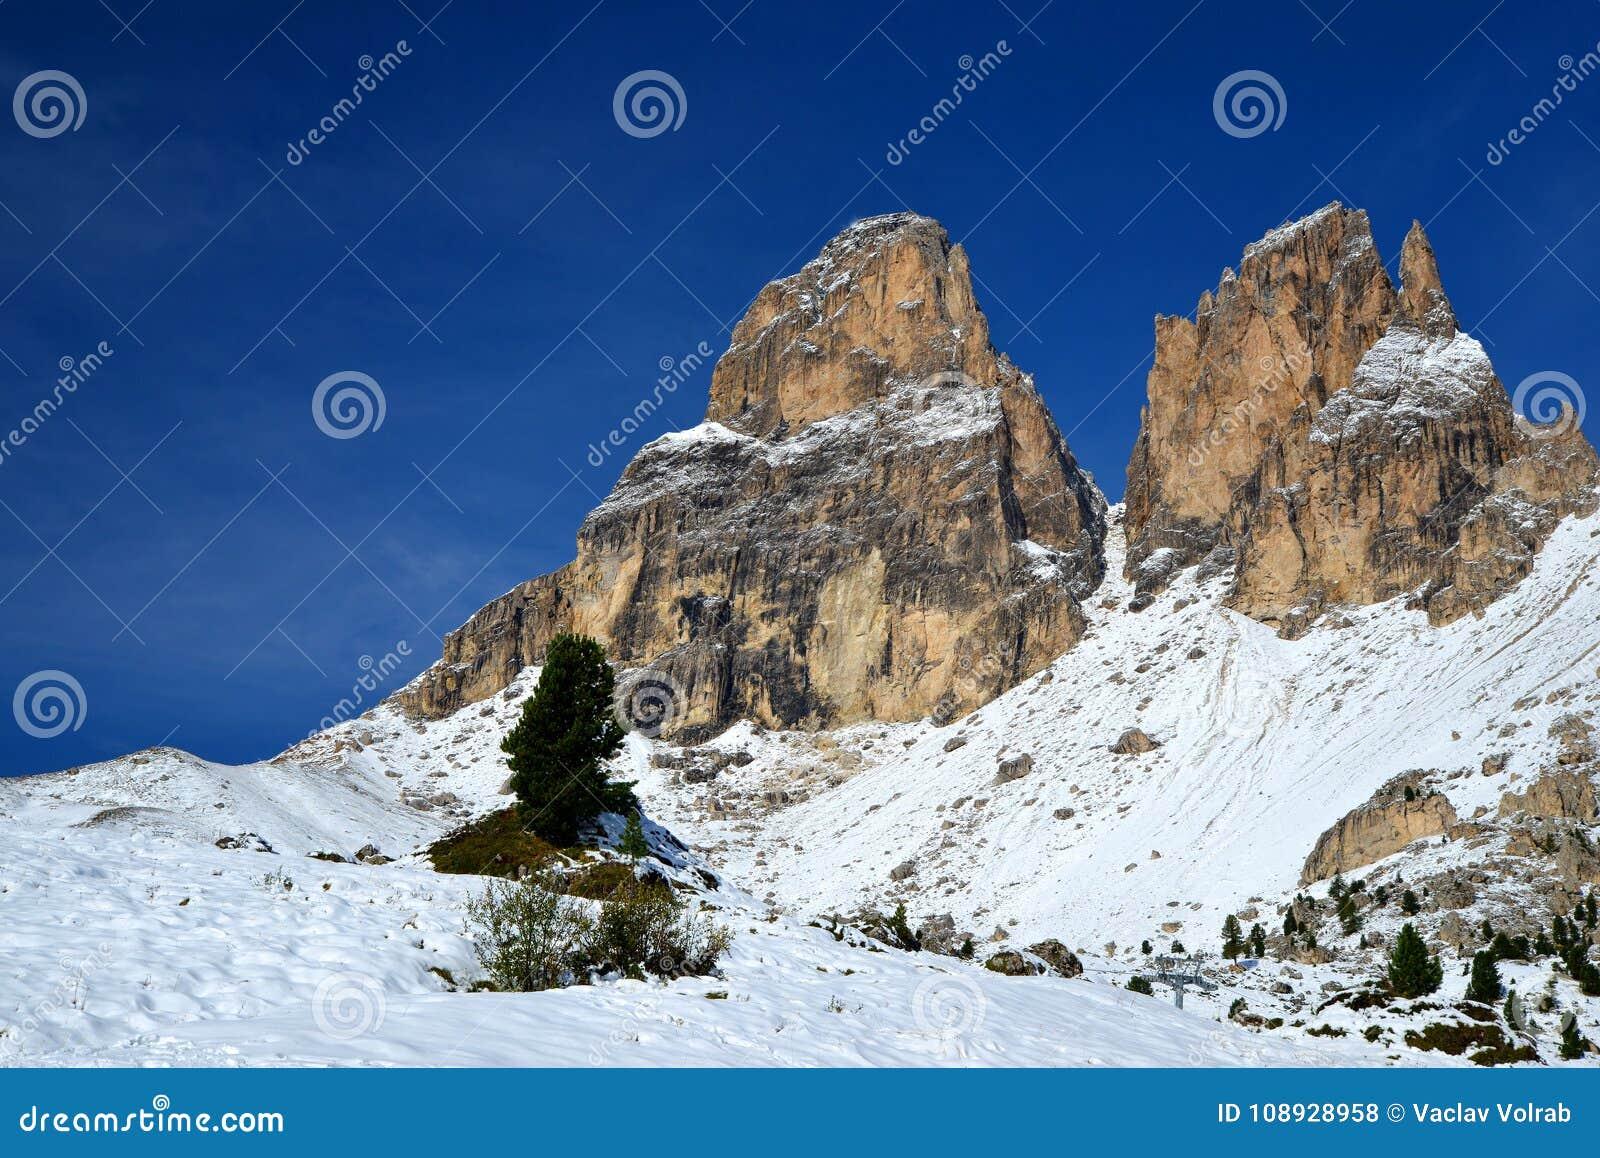 Mountain group Sassolungo Langkofel. South Tyrol, Italy.